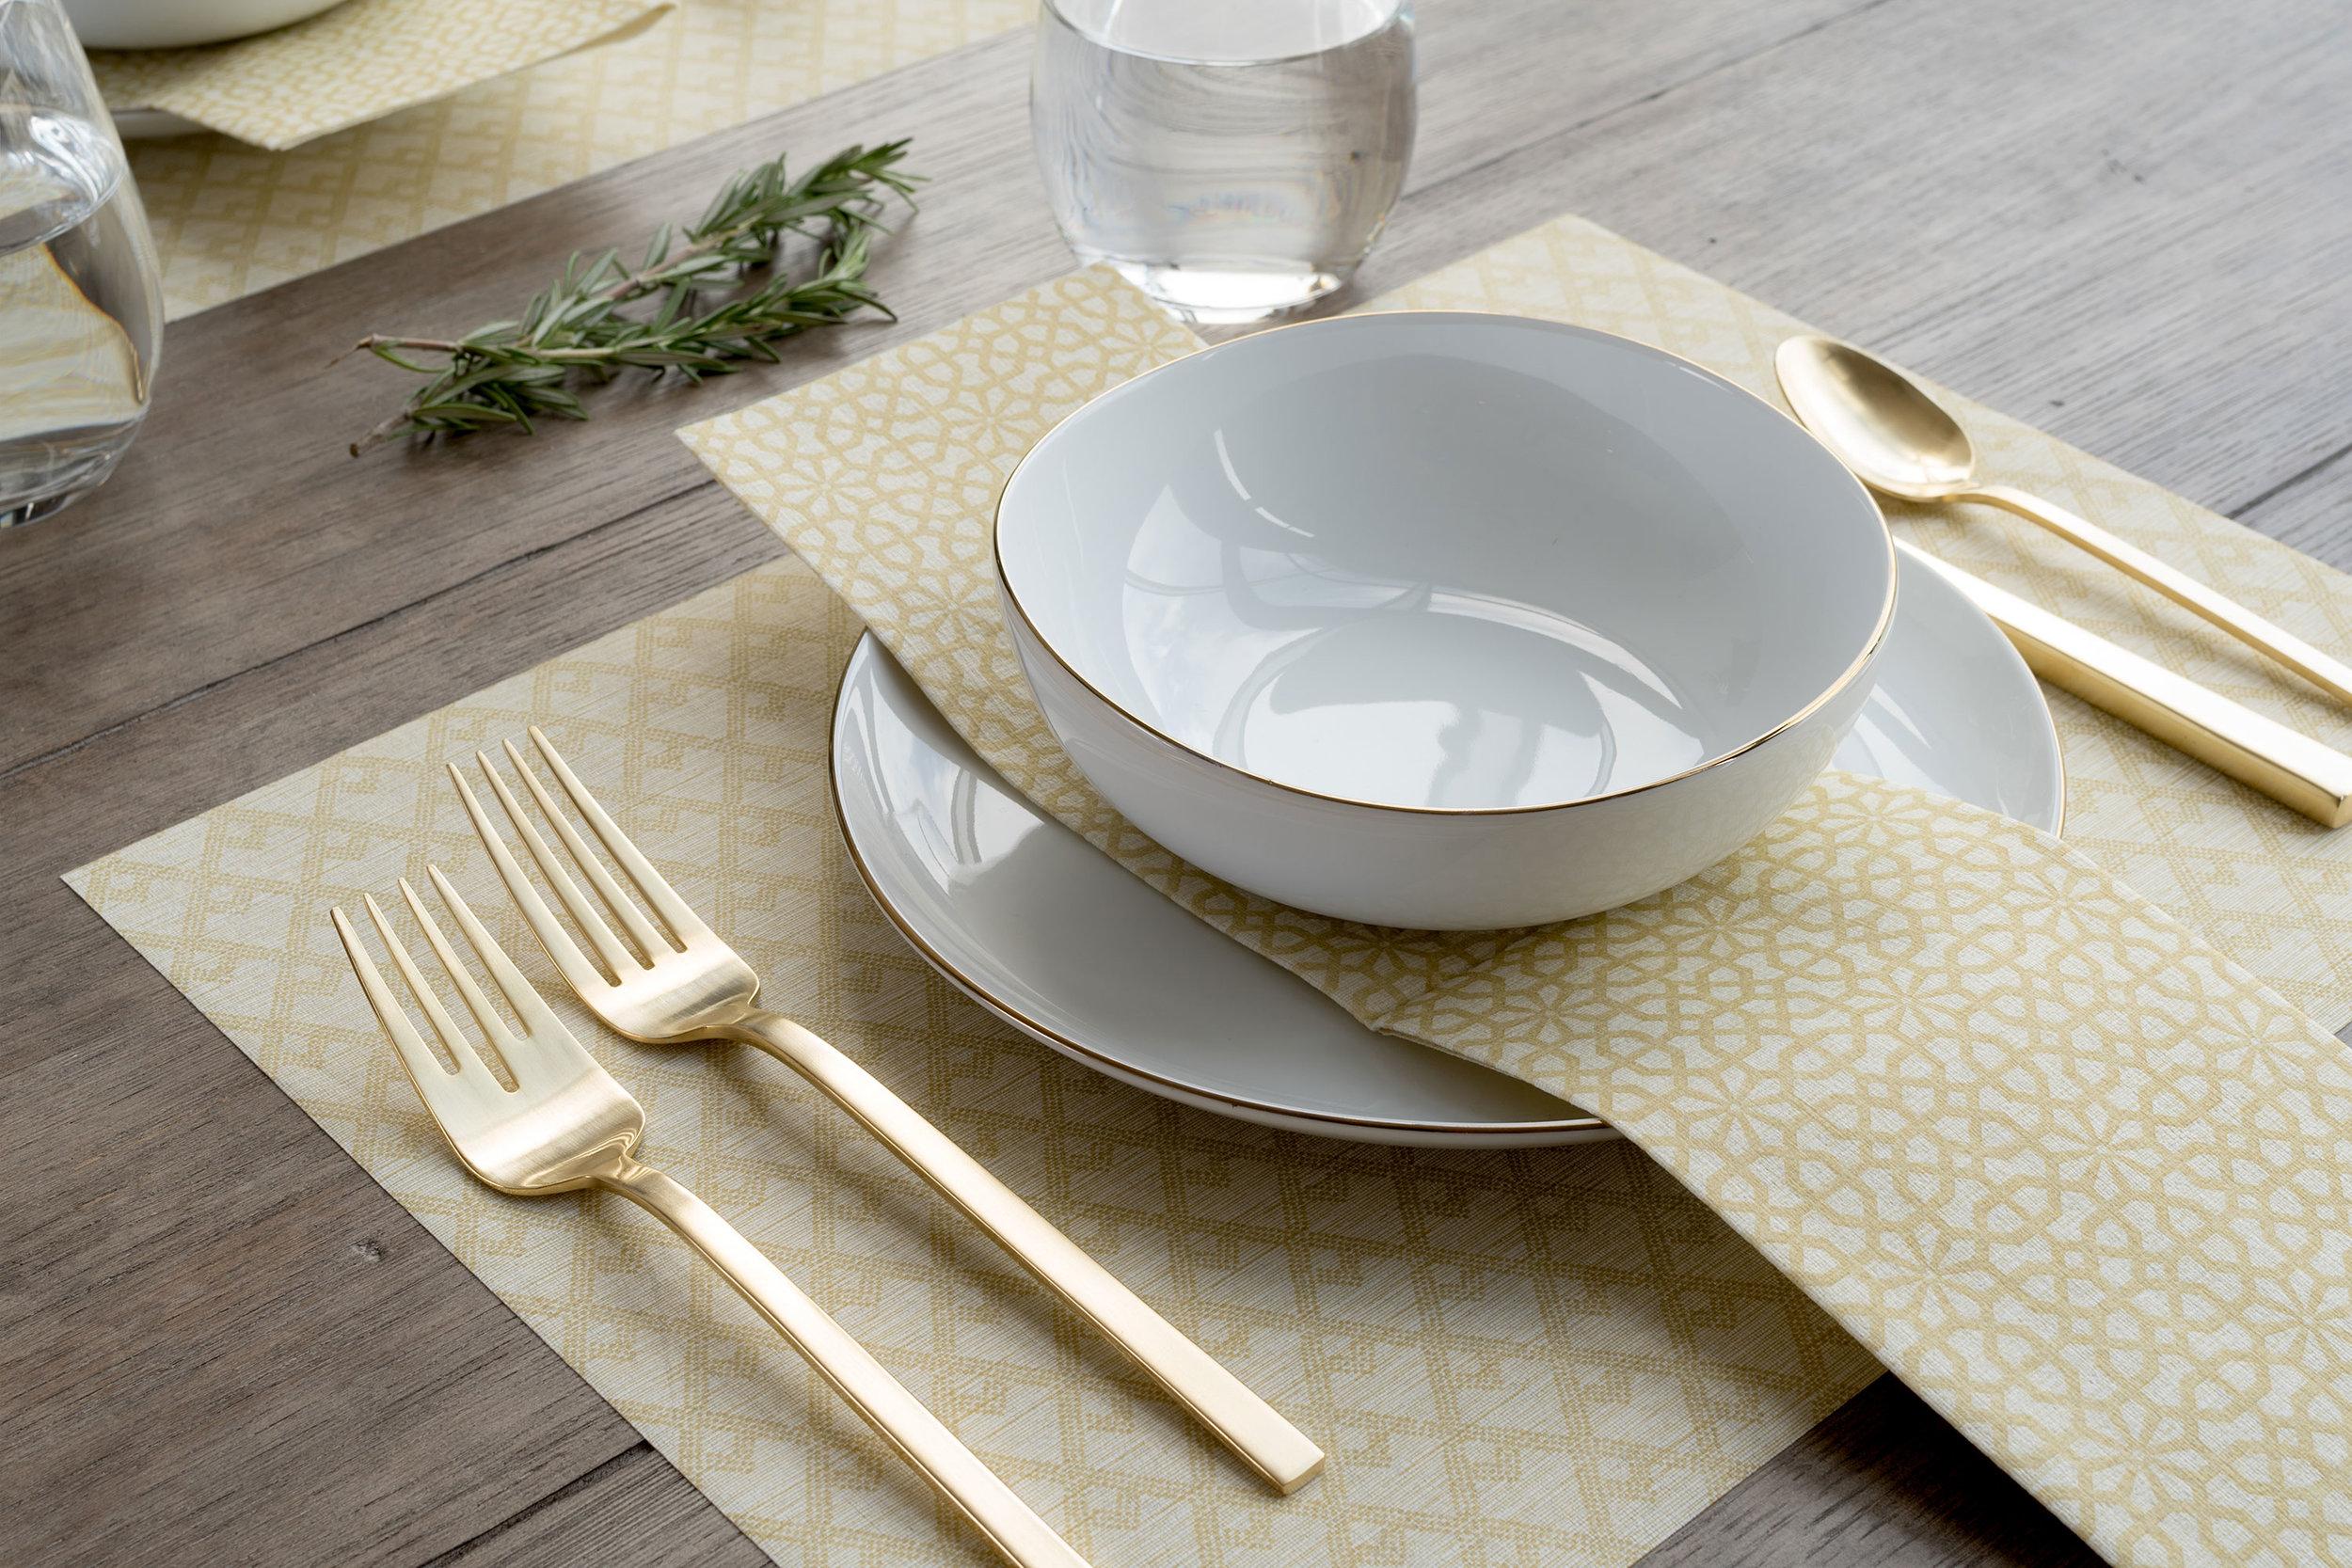 the napkins I DwellStudio Table Collection